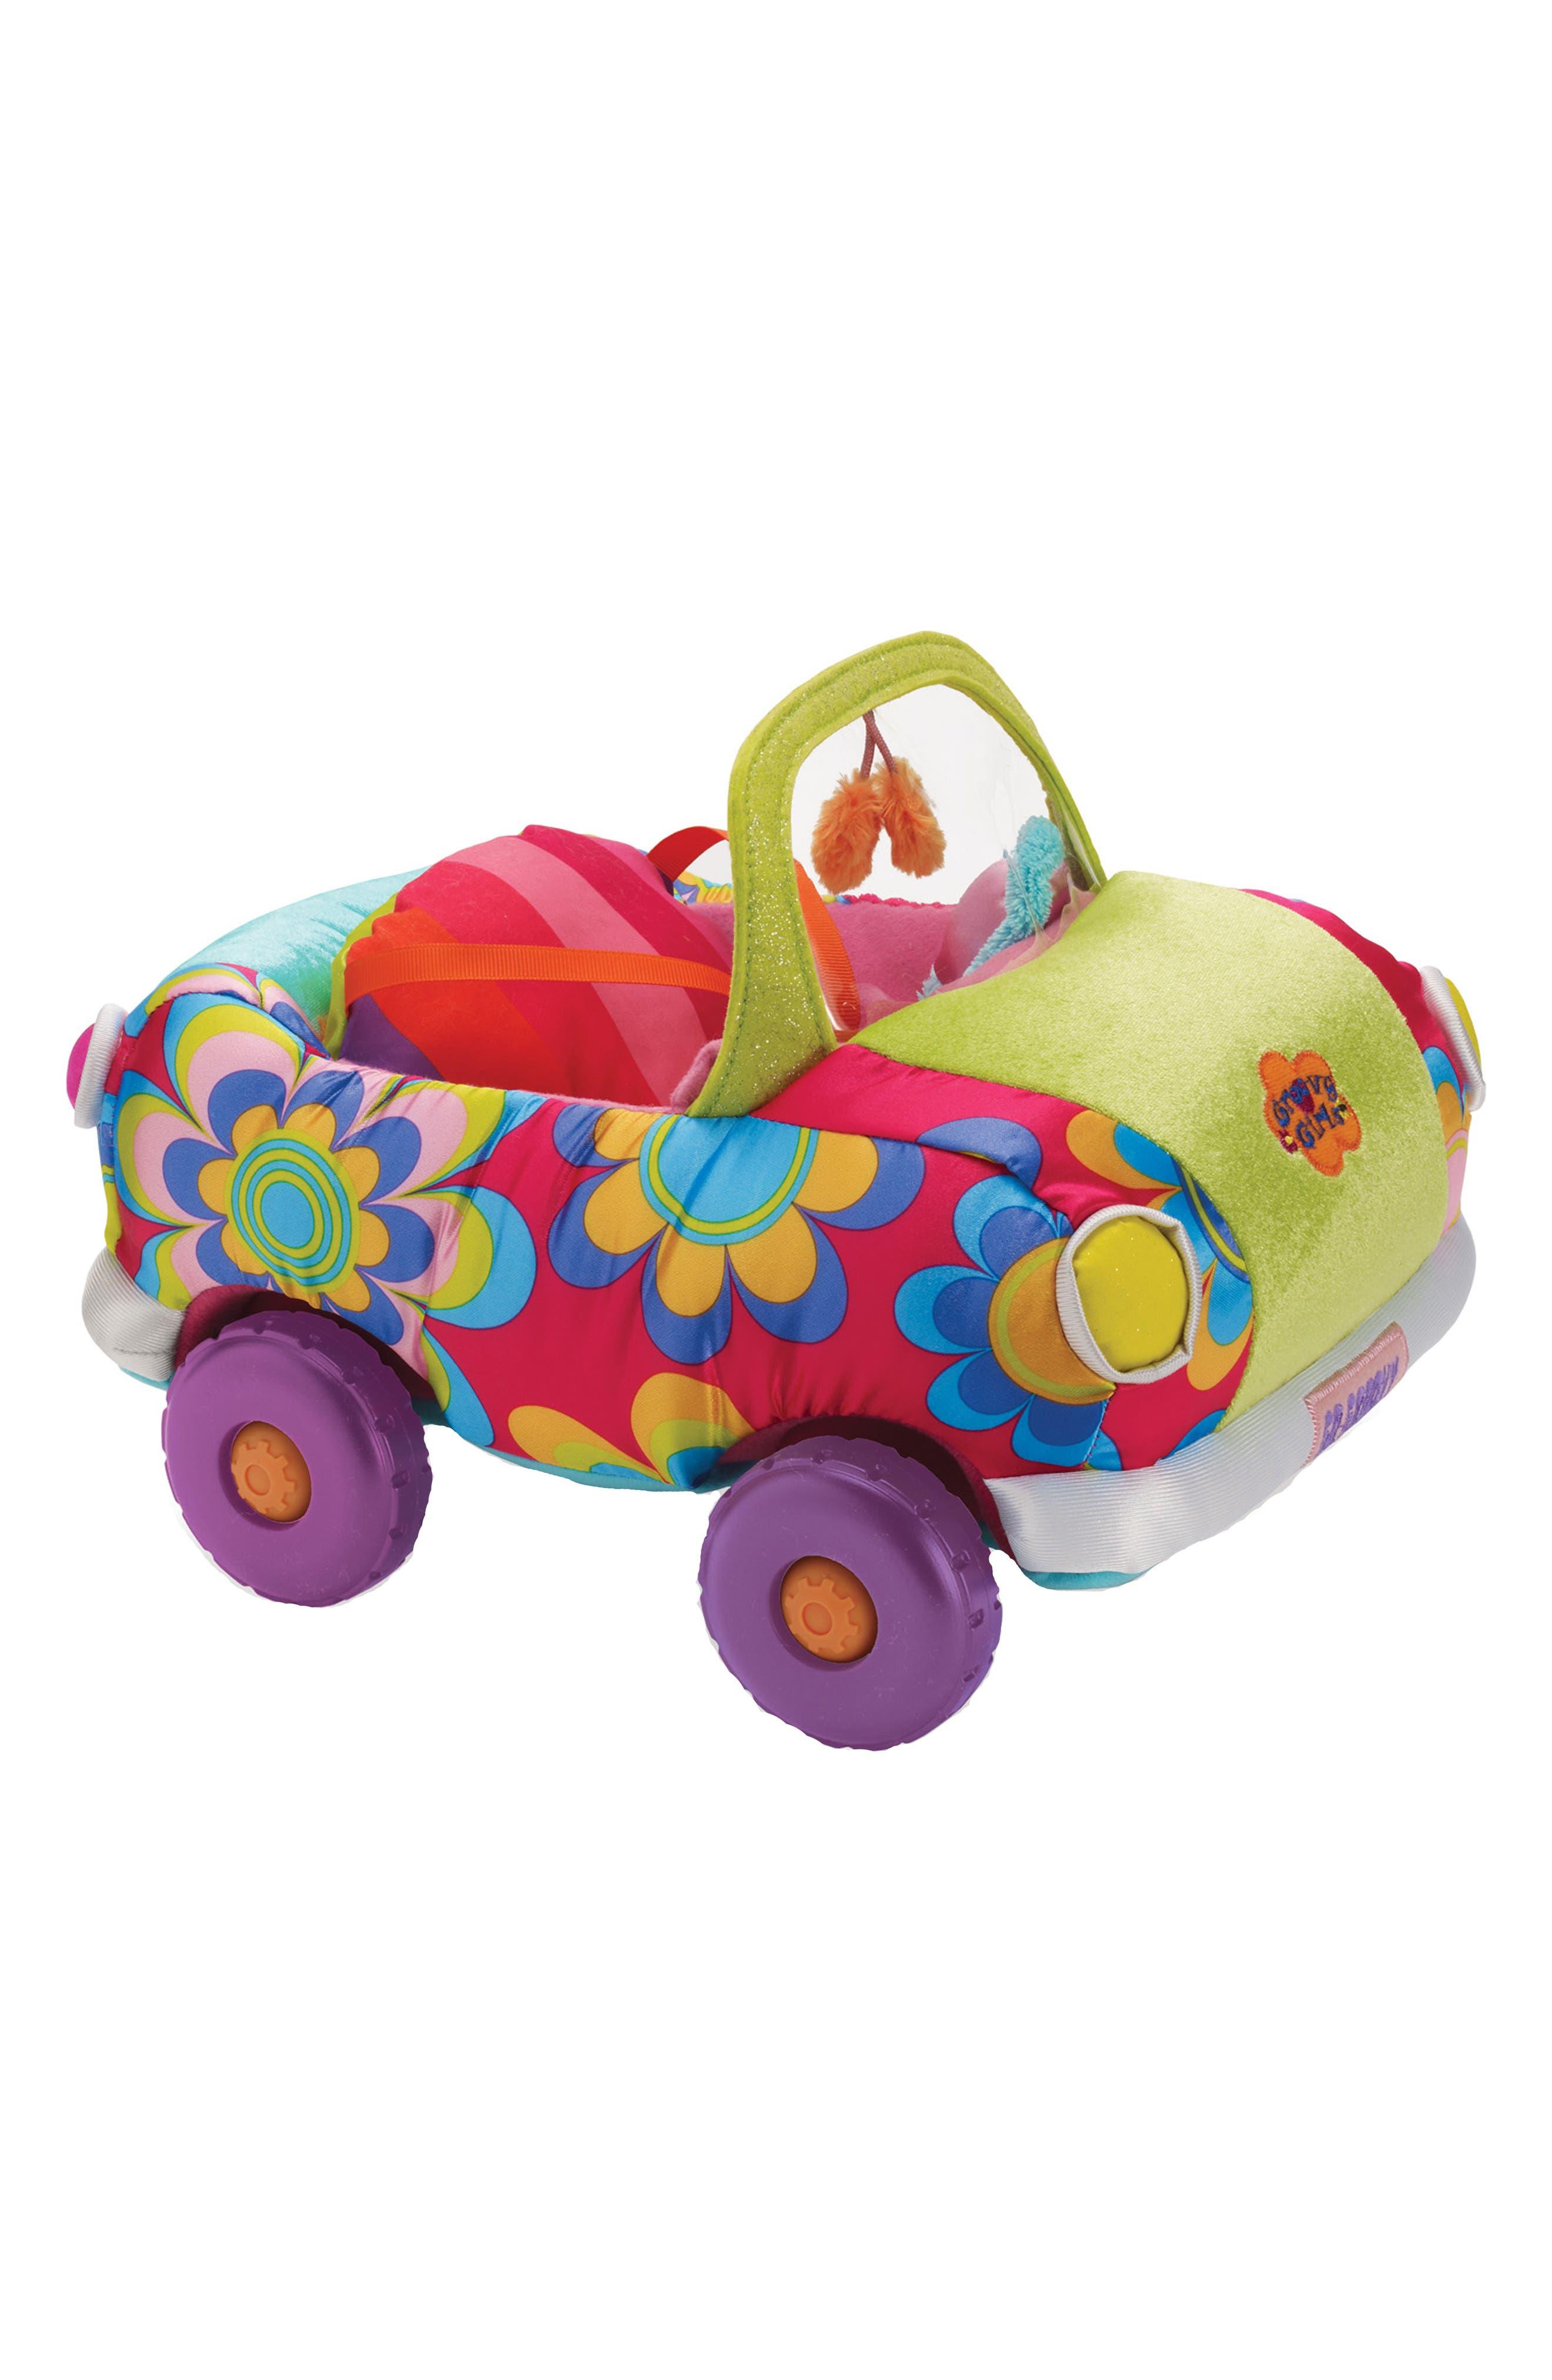 Groovy Girls - Wheelin' in Style Doll Mini Coupe,                             Main thumbnail 1, color,